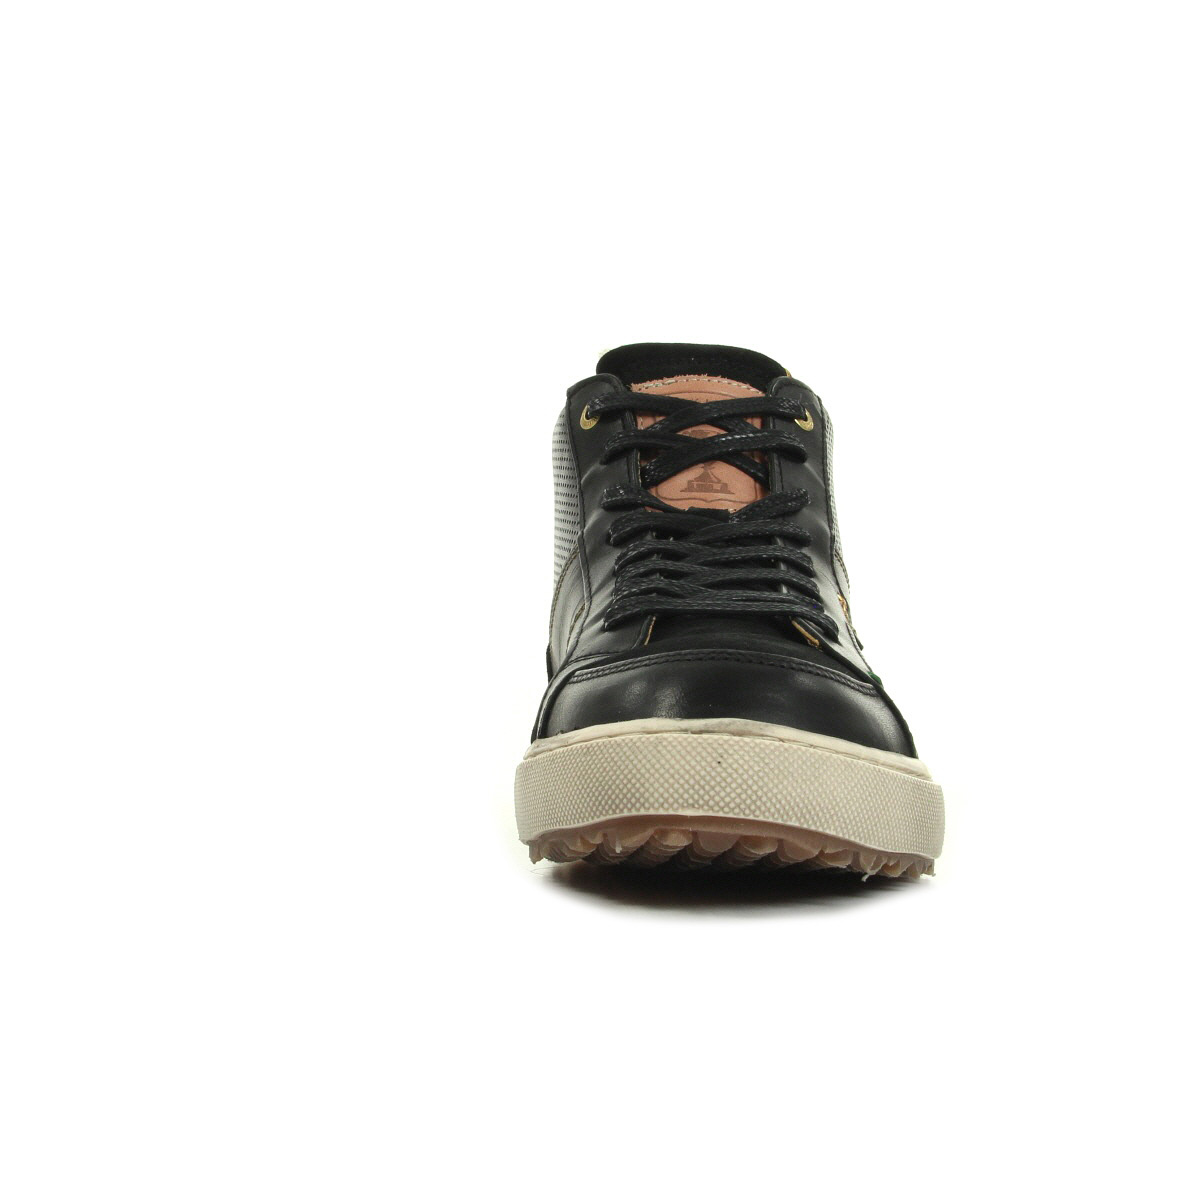 Baskets Pantofola d'Oro Teco Pelliccia Mid Black 2cNbB